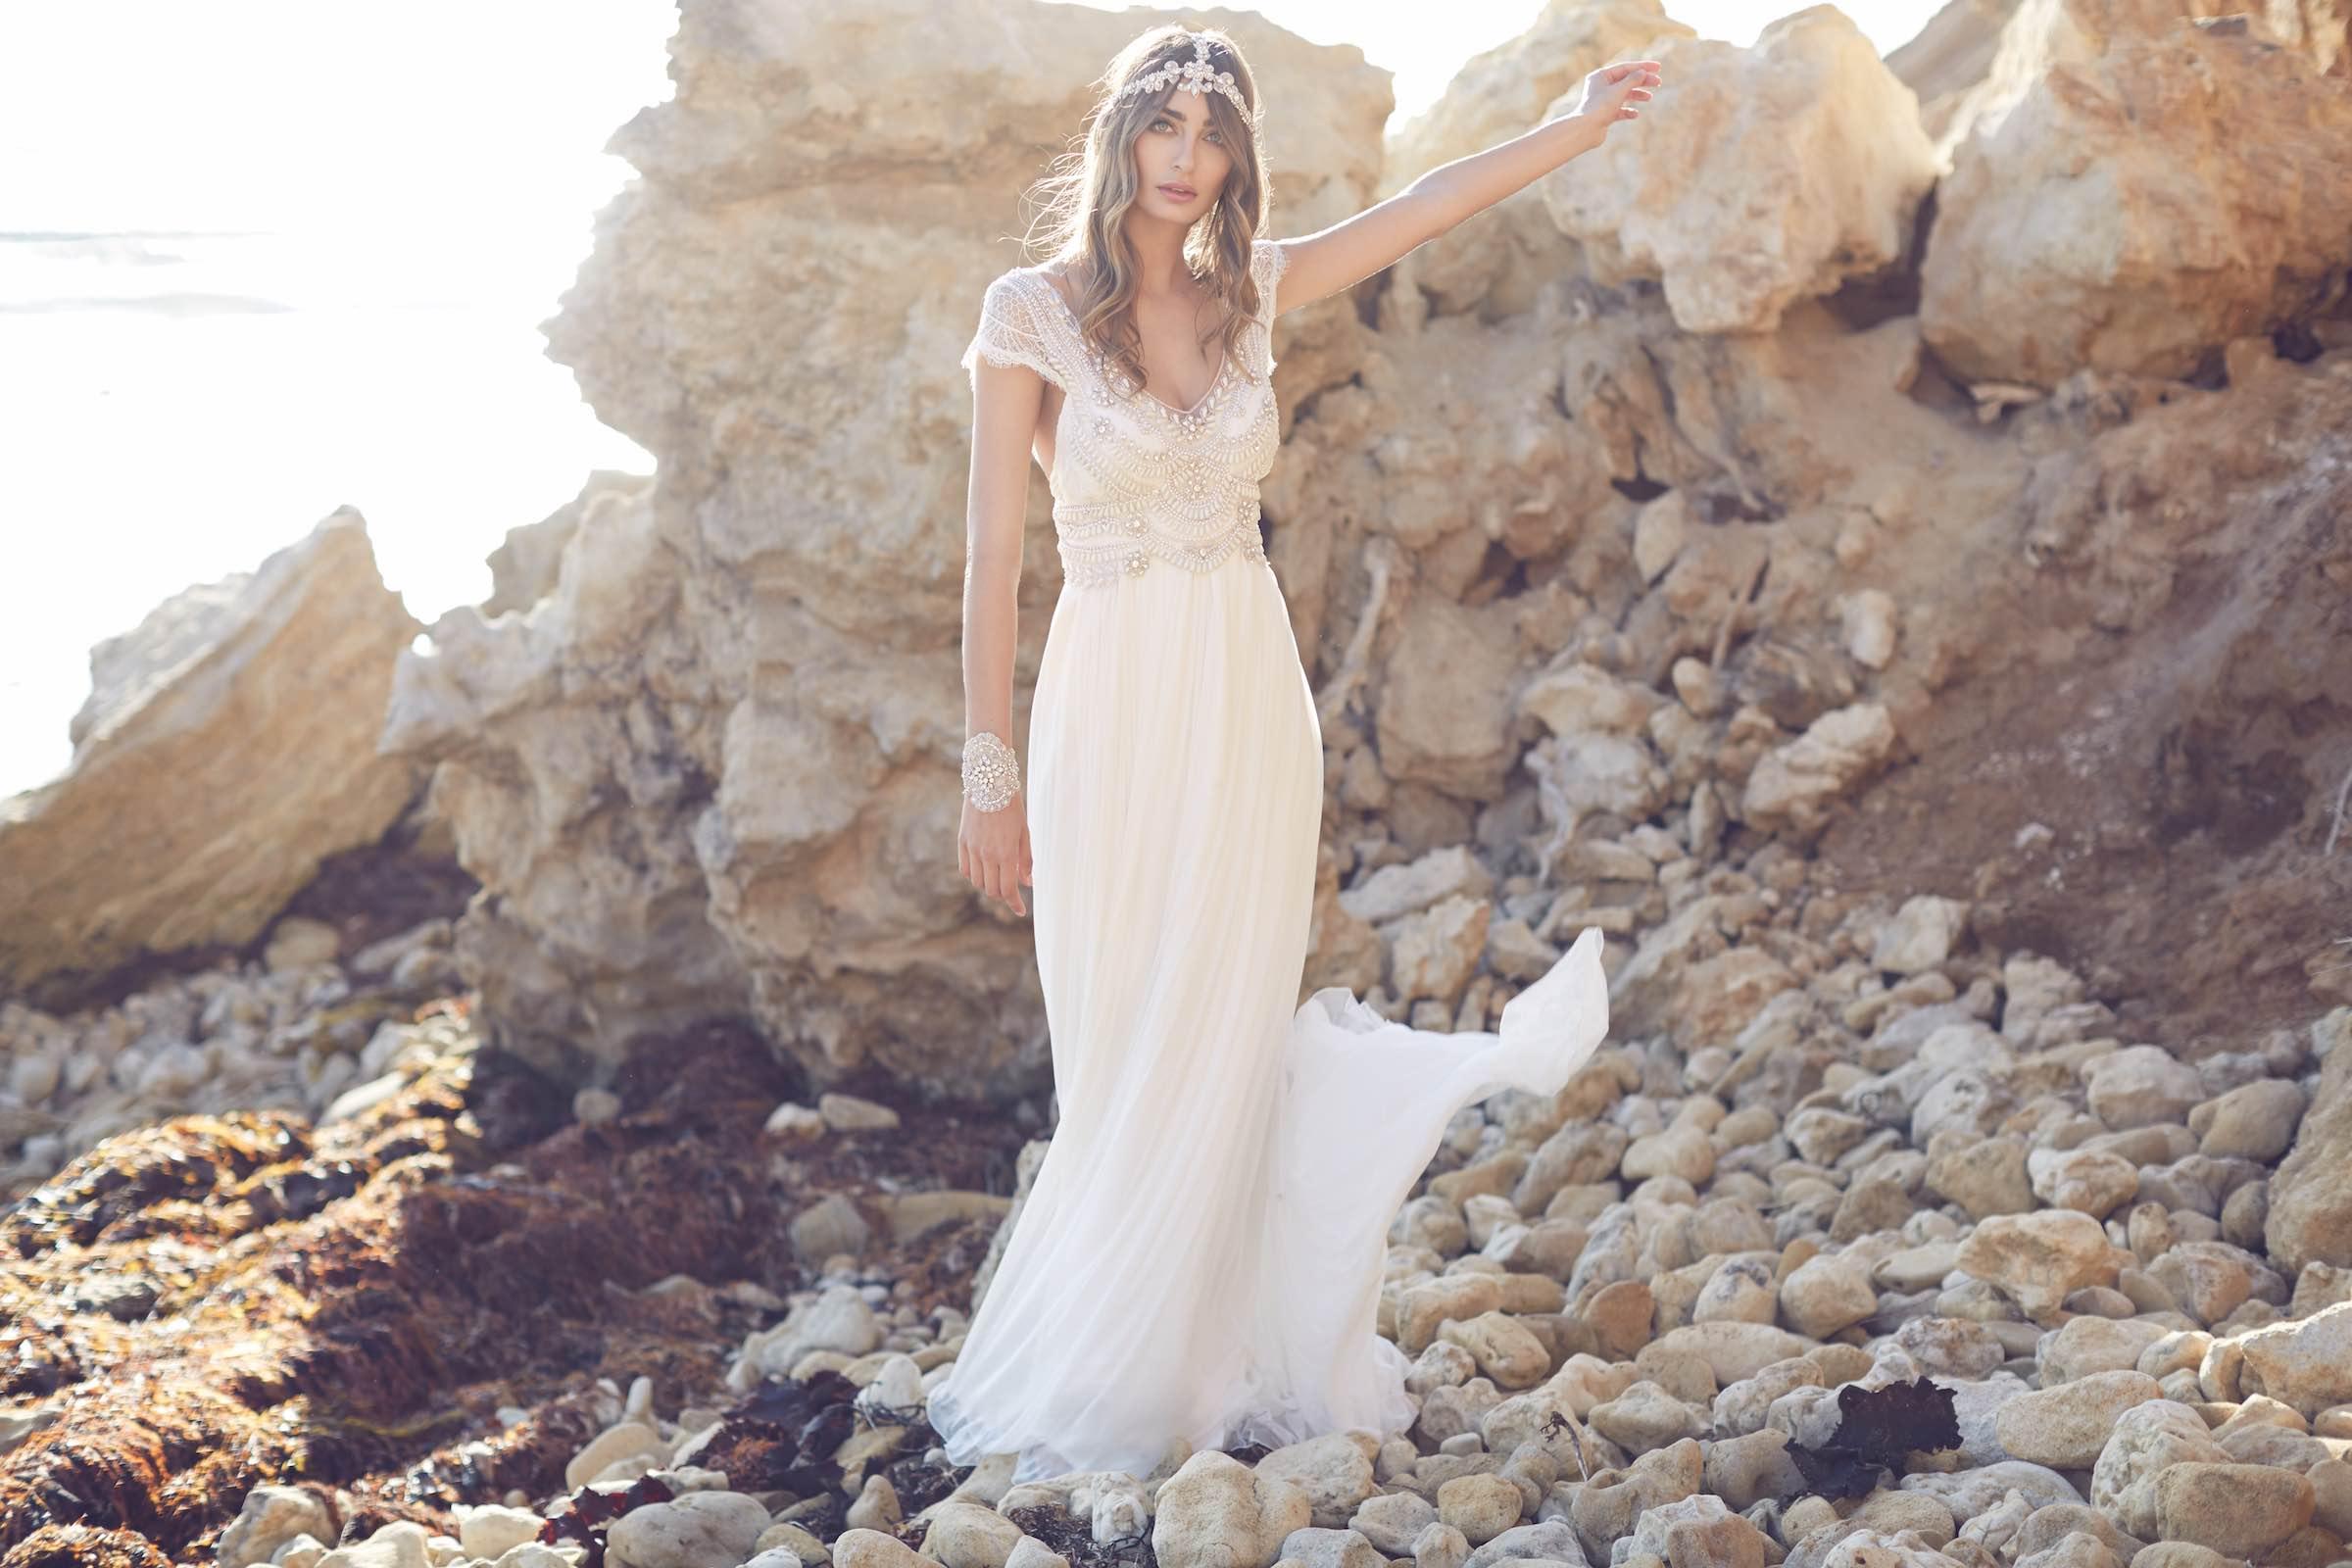 Anna Campbell Coco Dress   Vintage inspired embellished wedding dress